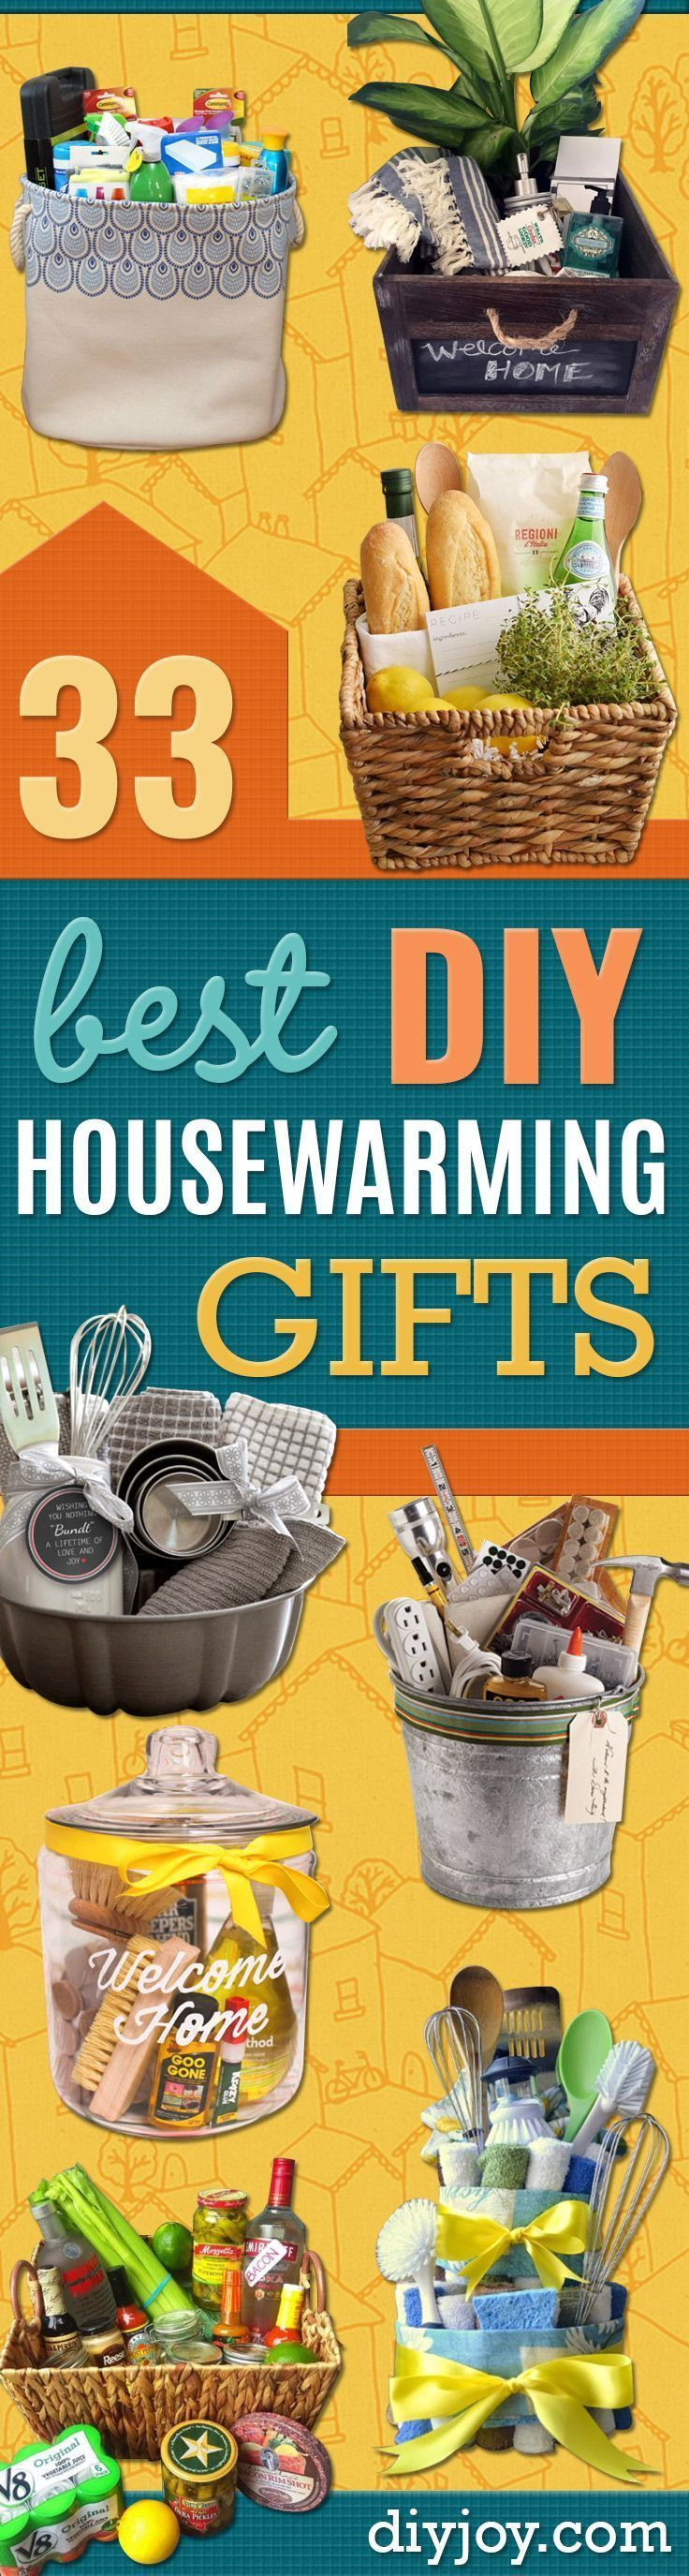 33 best diy housewarming gifts create diy